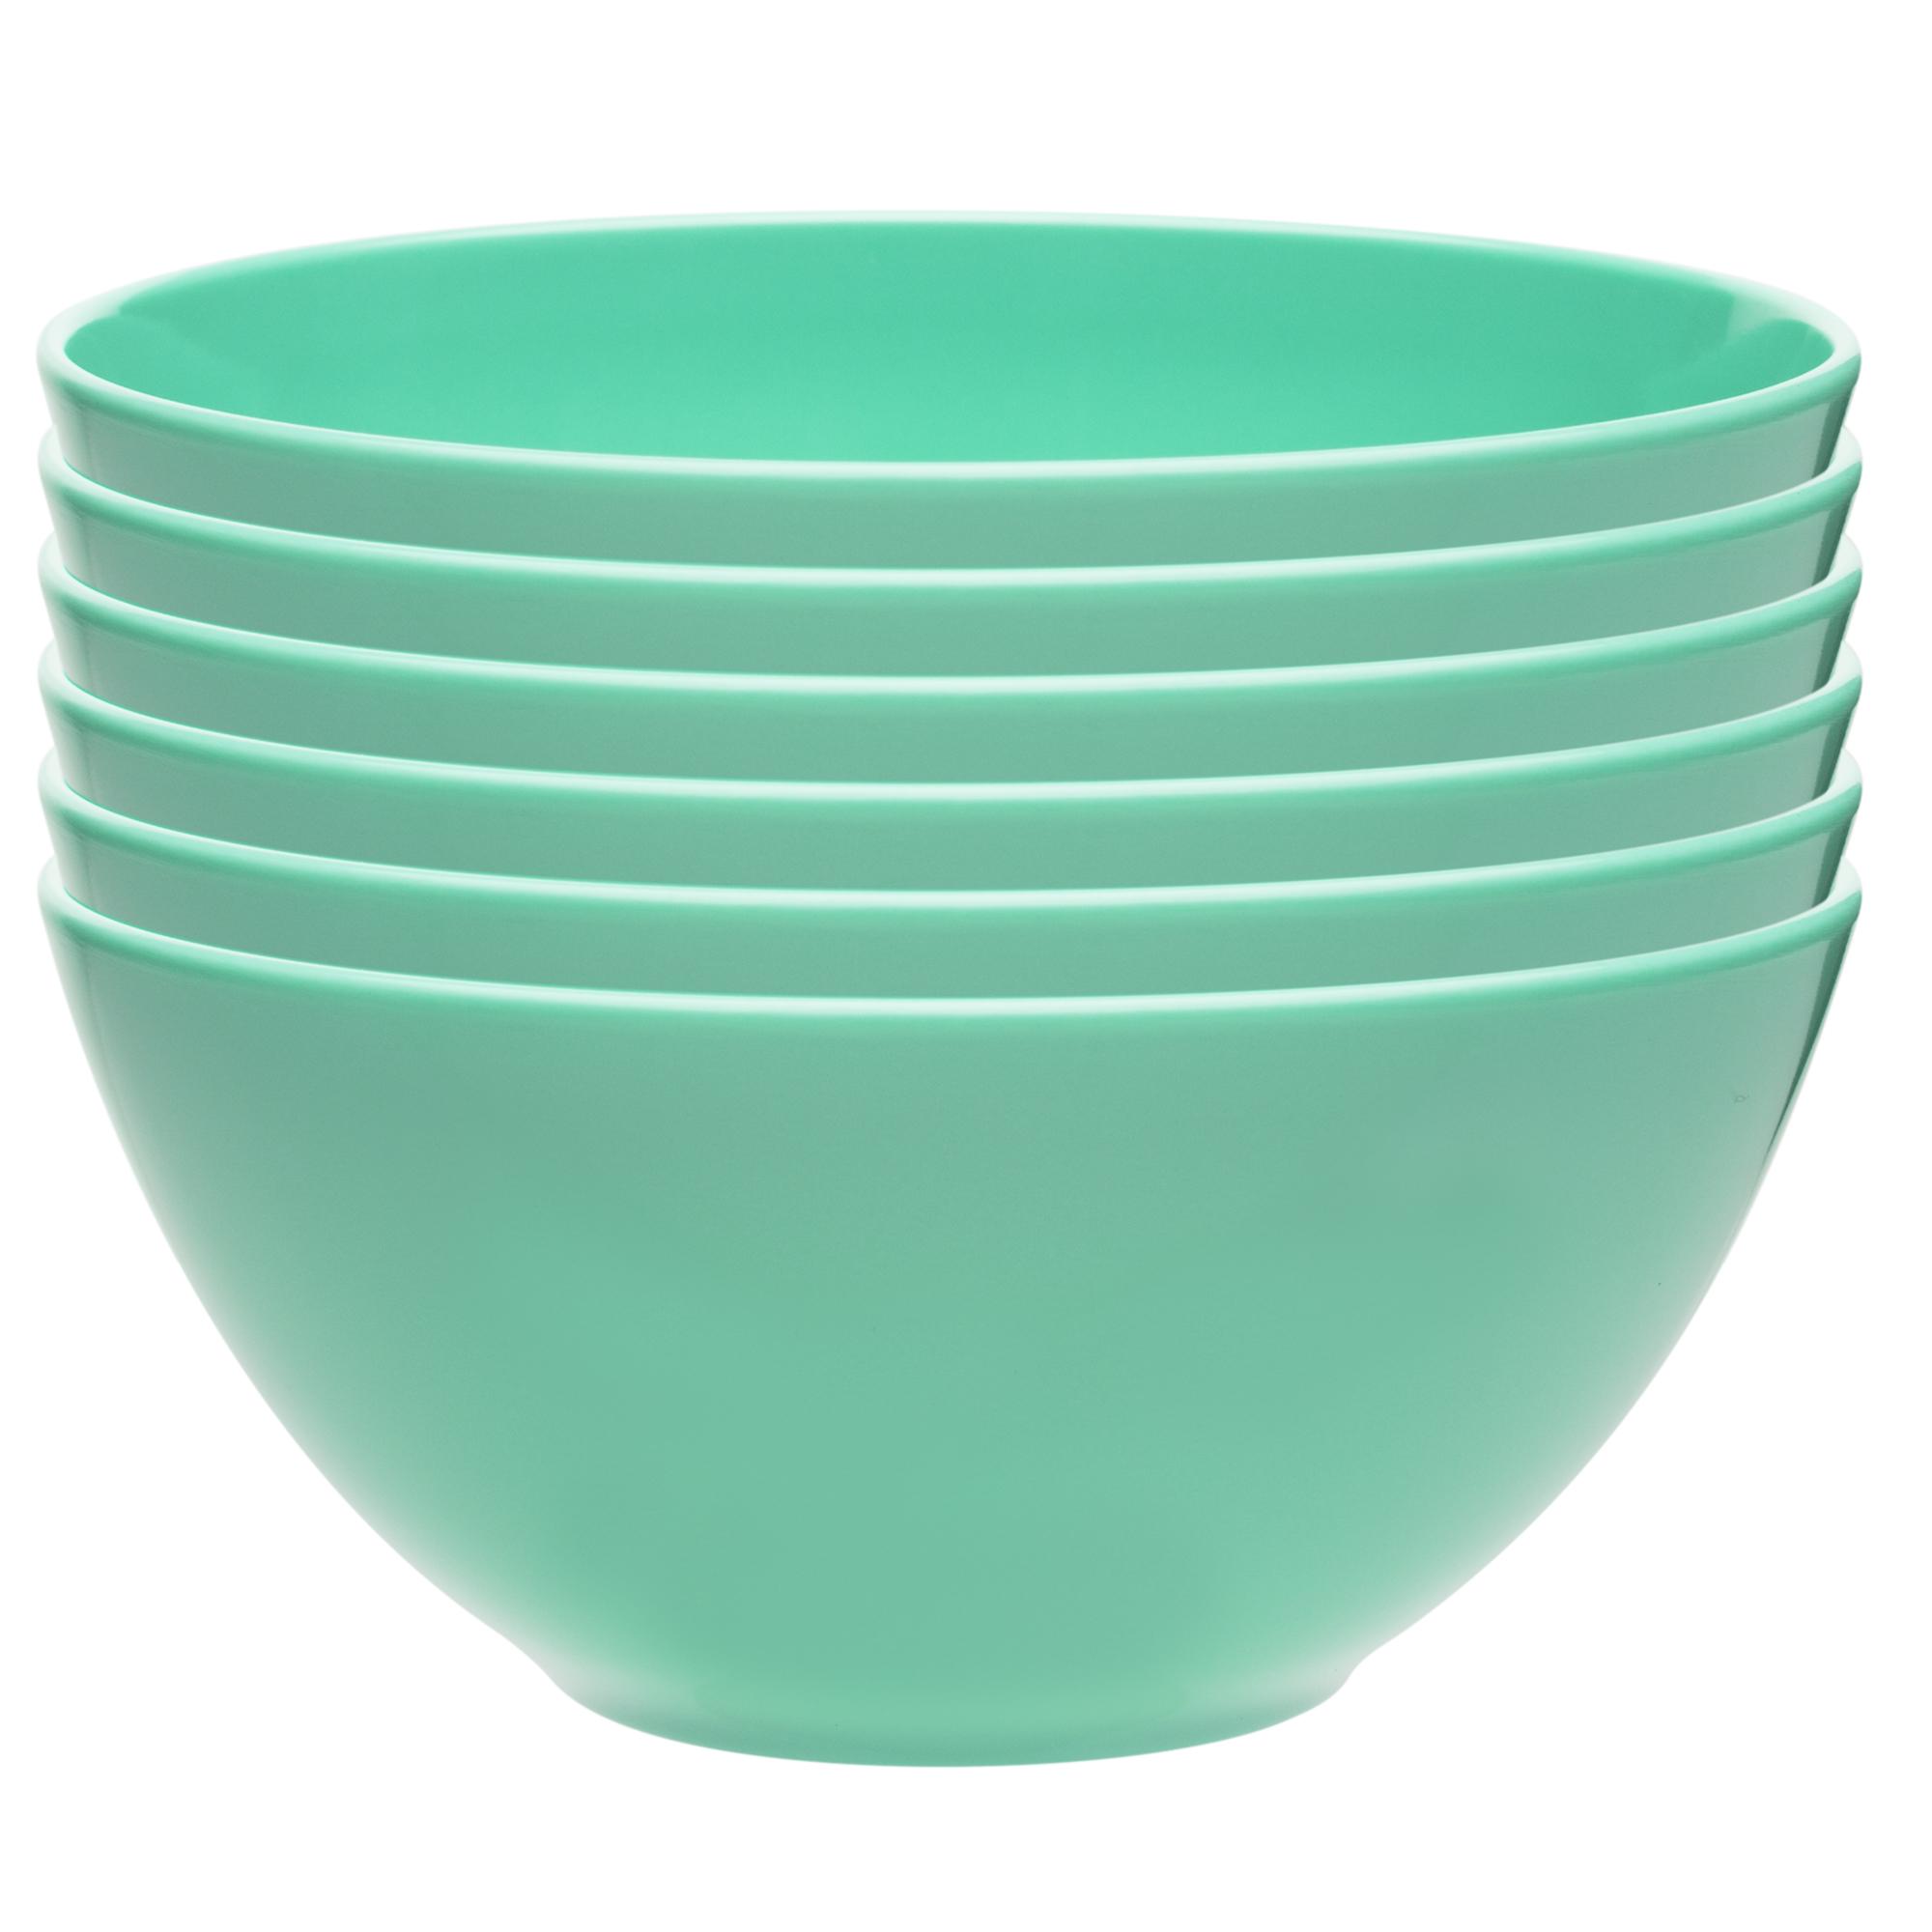 Ella 30 ounce Soup Bowl, Seaglass, 6-piece set slideshow image 1